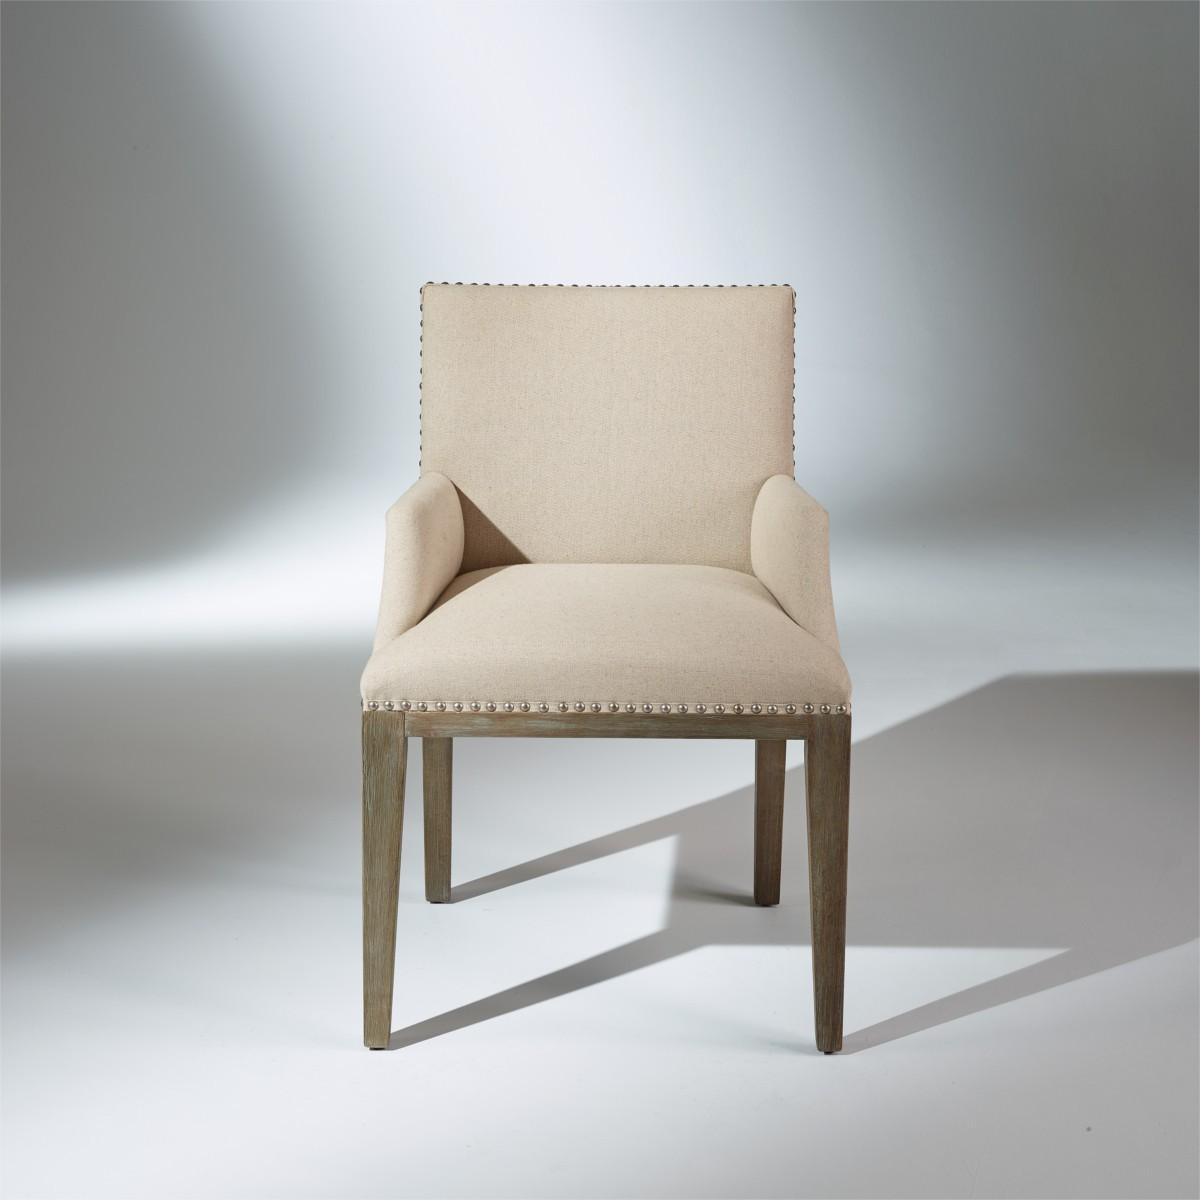 fauteuil de table kenza lin. Black Bedroom Furniture Sets. Home Design Ideas